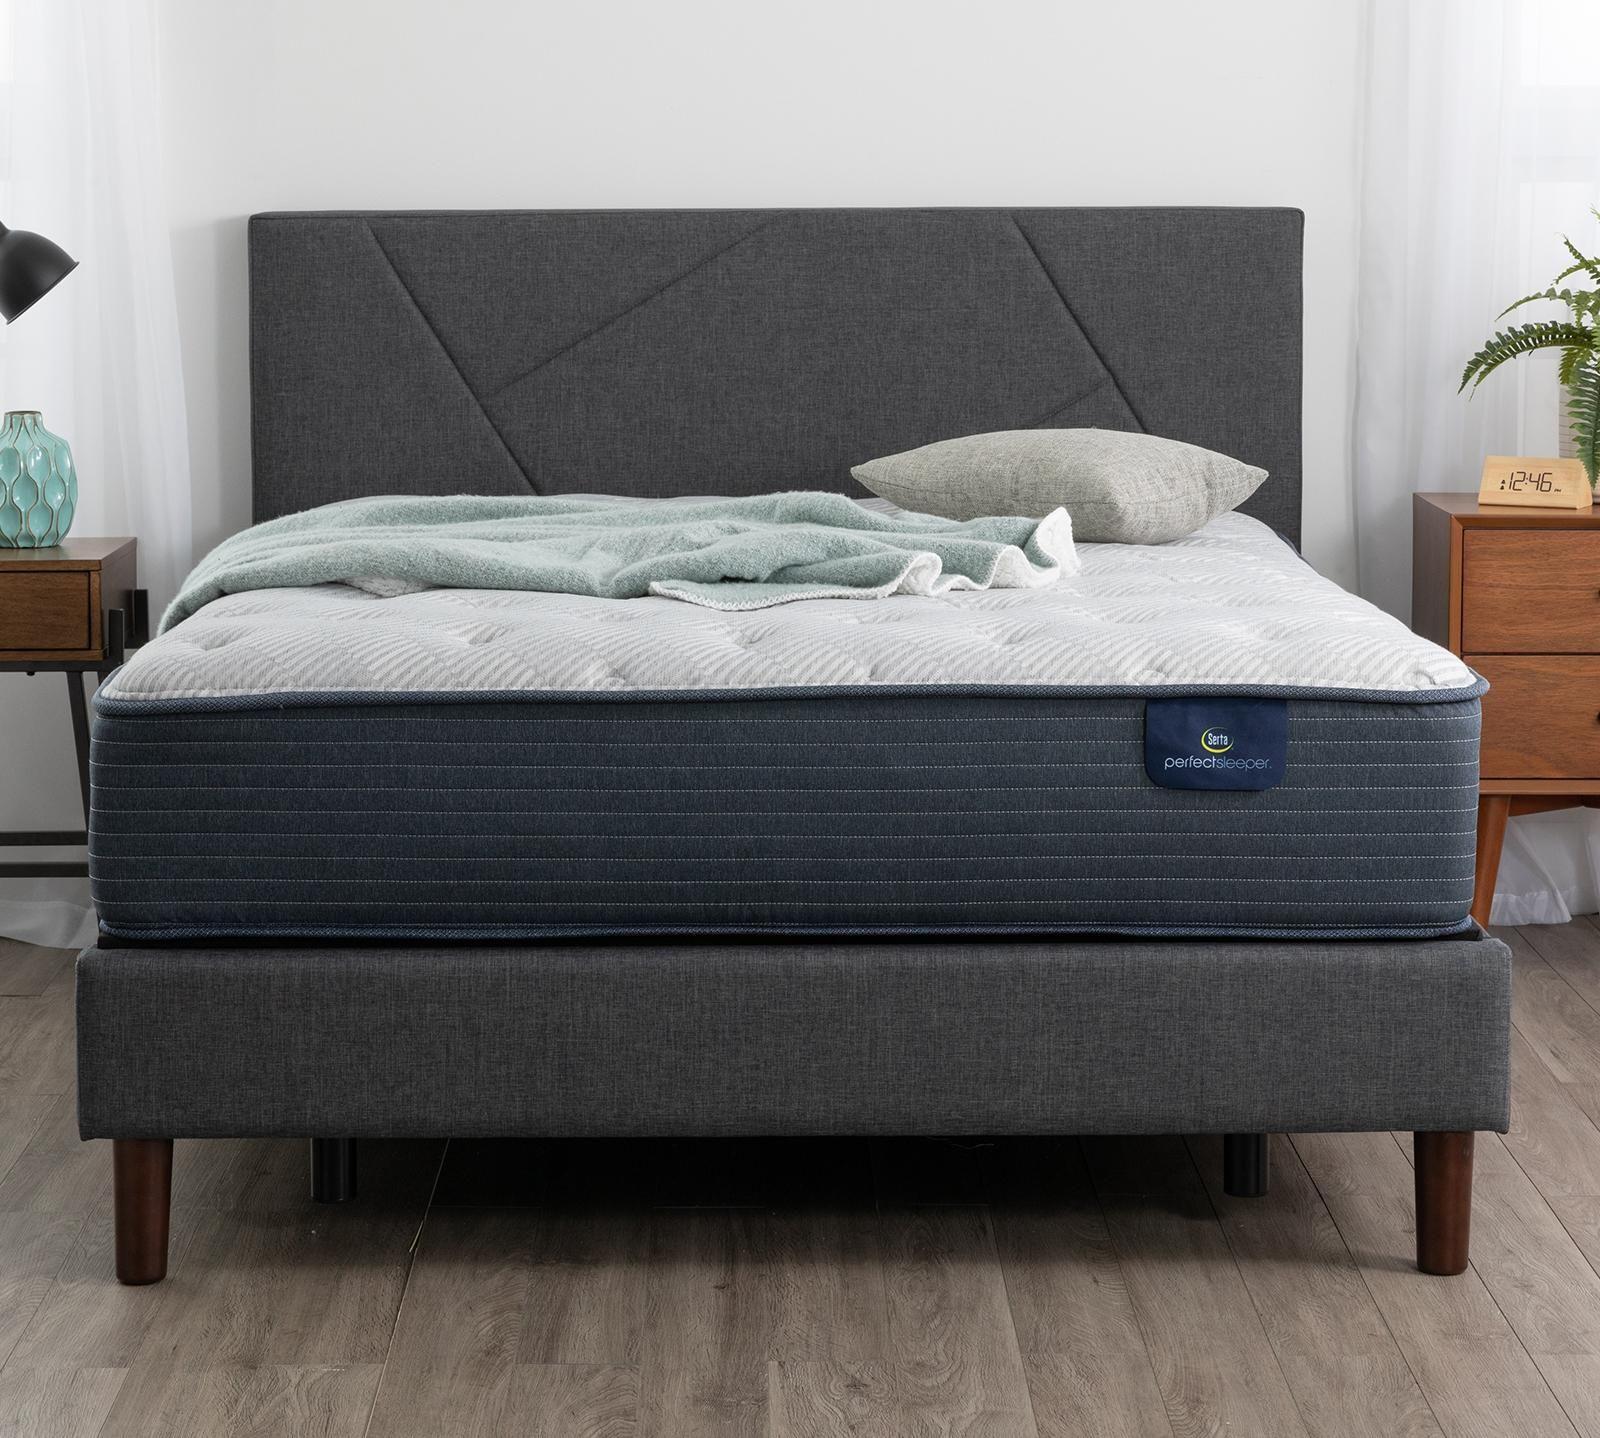 Serta Perfect Sleeper Sandburg 11 5 Firm Mattress In 2021 Firm Mattress Serta Perfect Sleeper Mattress